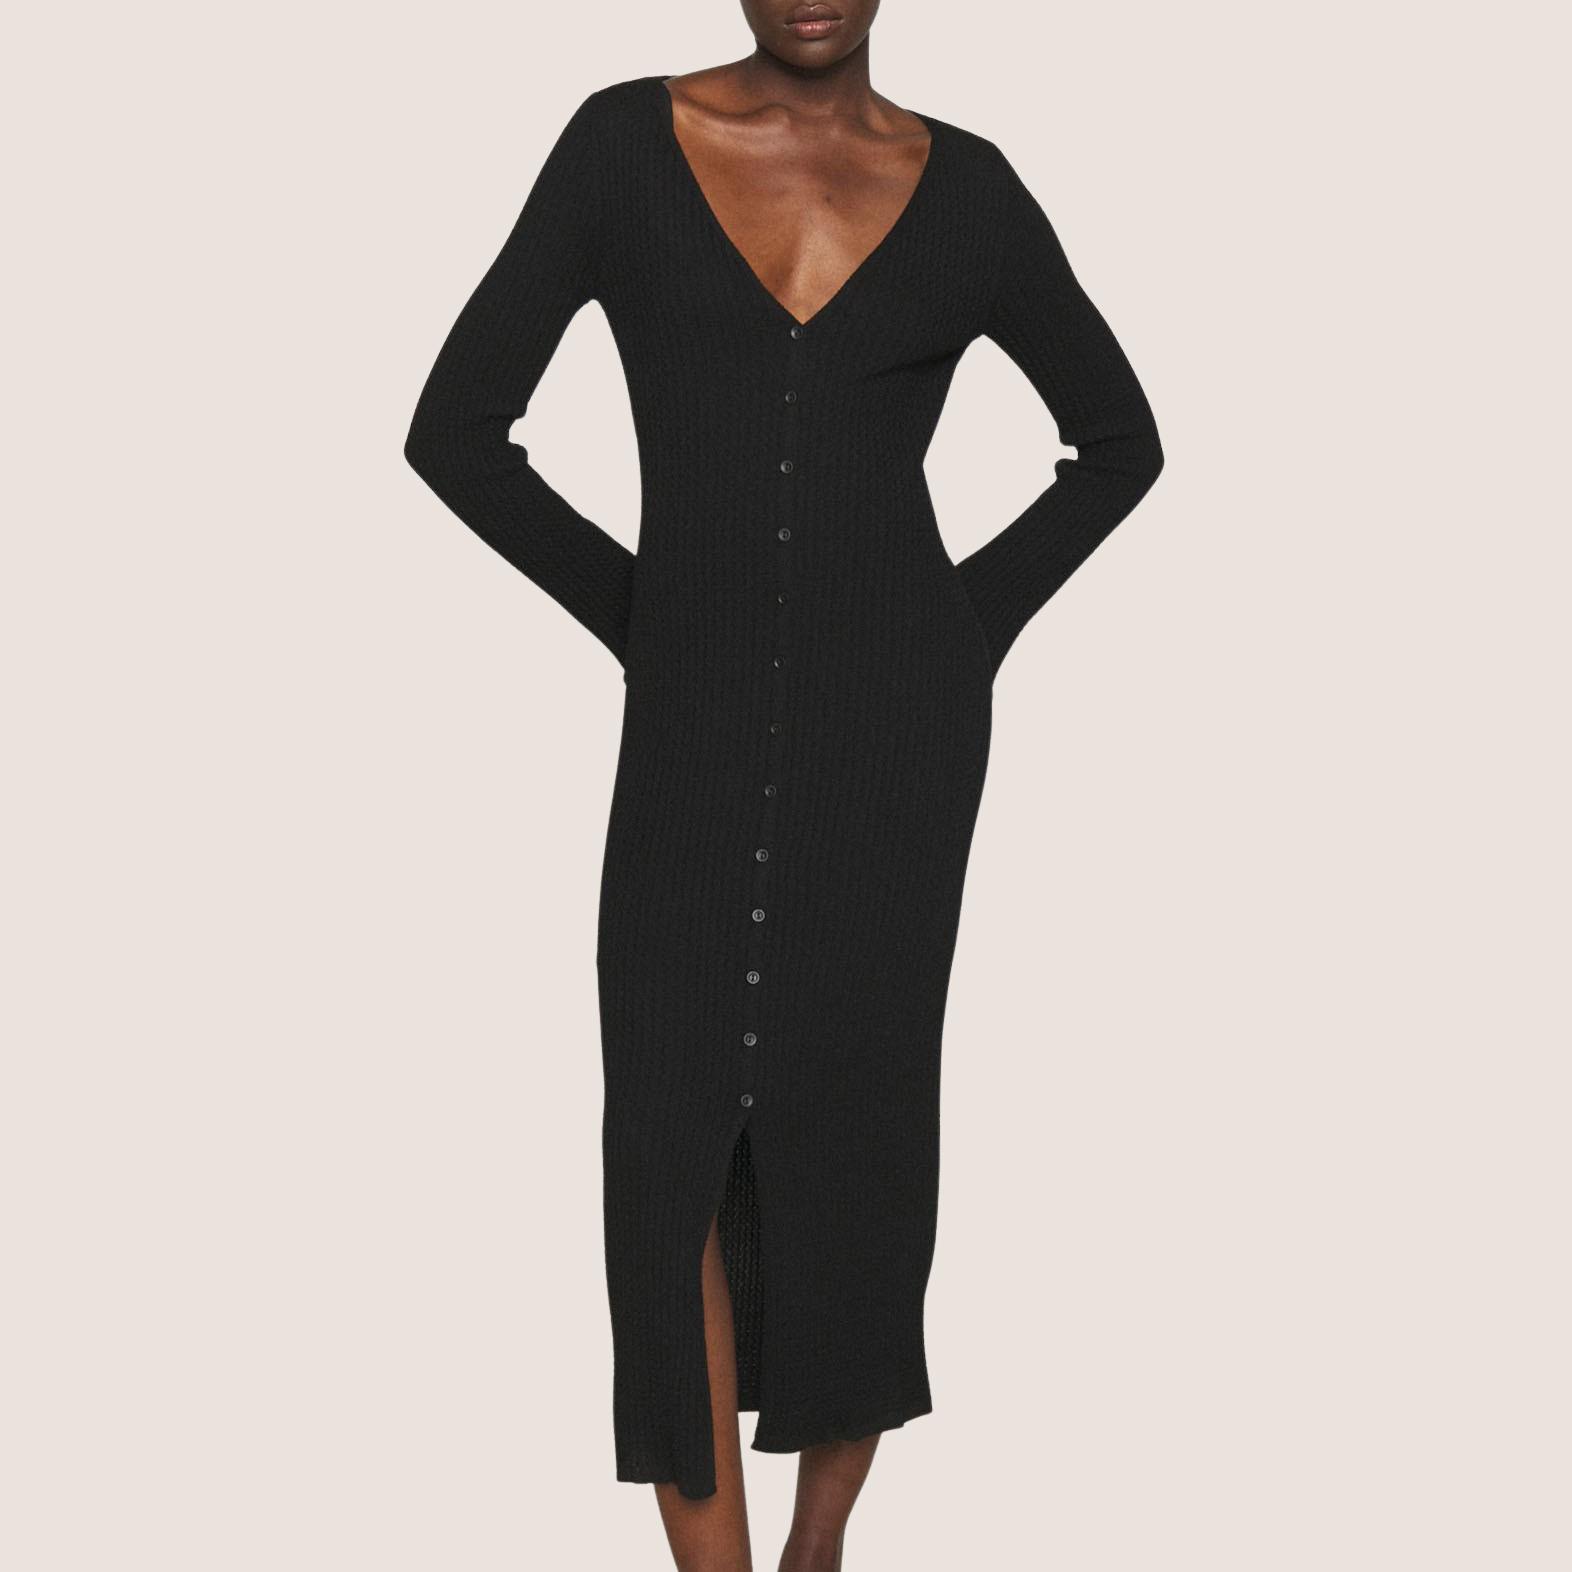 Long Bottom Down Knit Dress